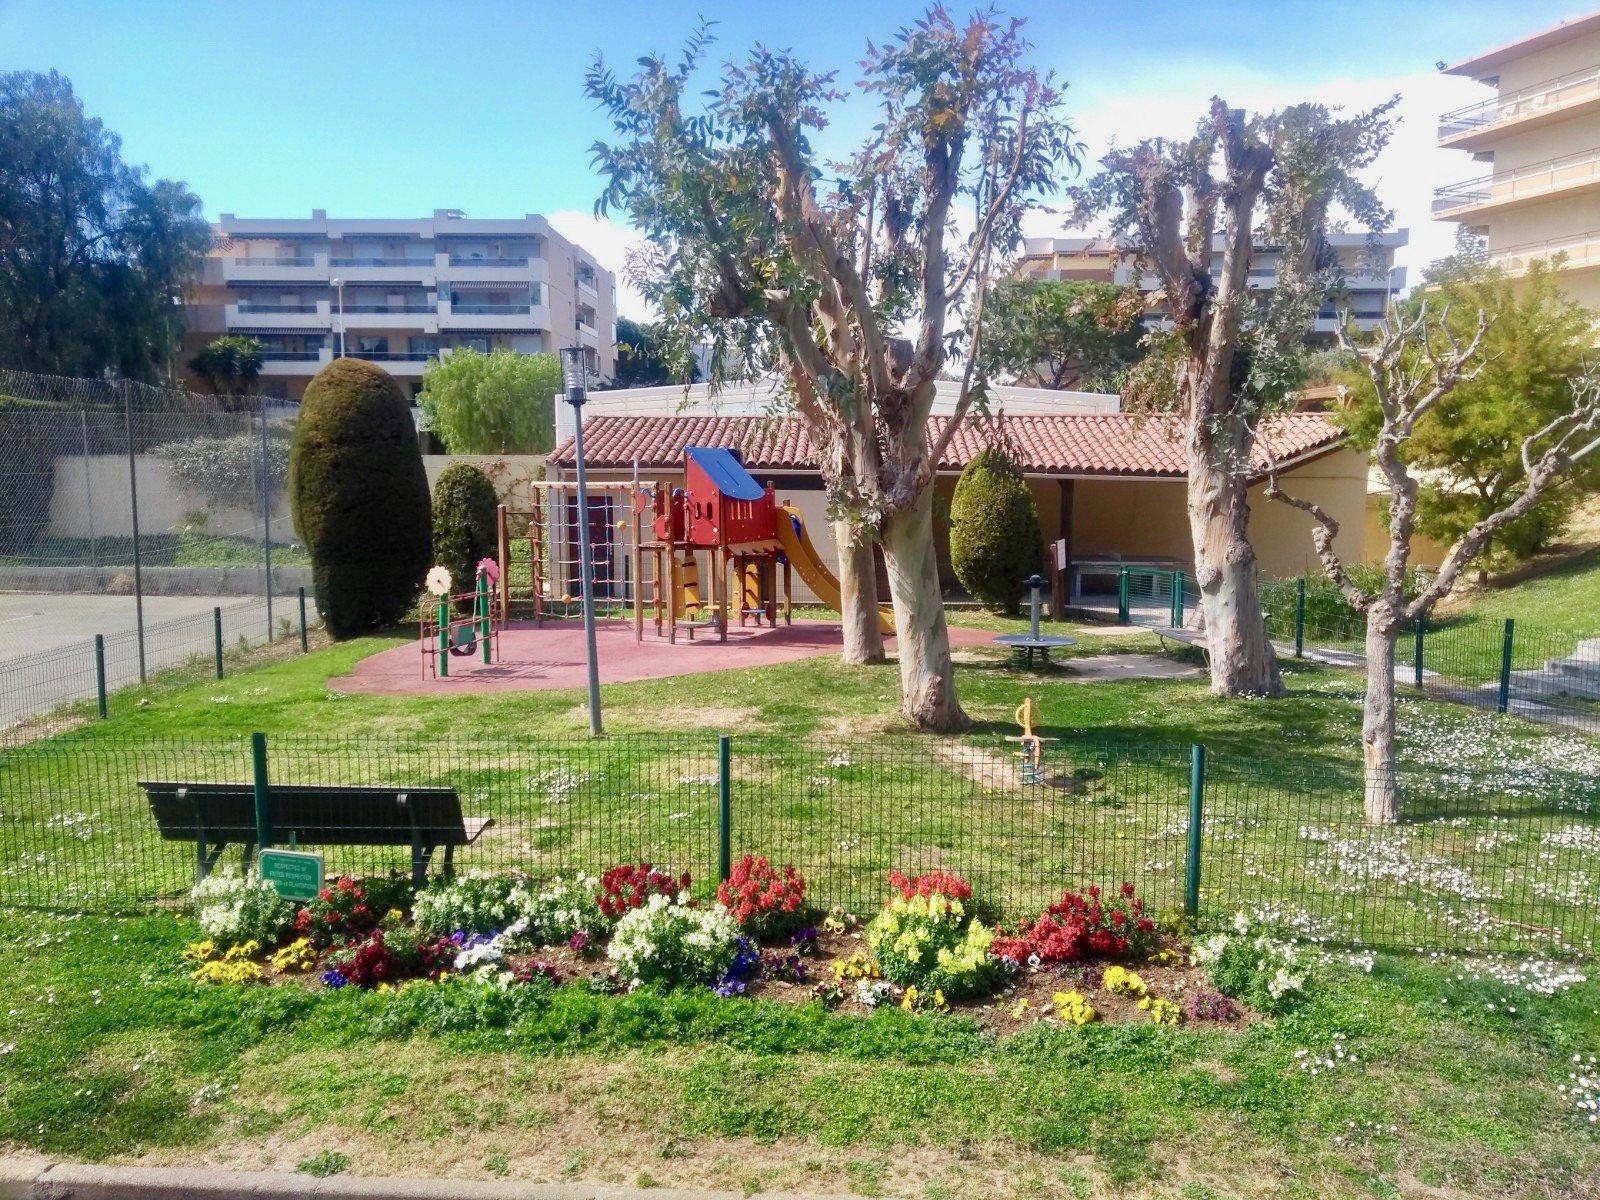 Продажа Апартаменты - Сен-Лоран-дю-Вар (Saint-Laurent-du-Var) Les Vespins